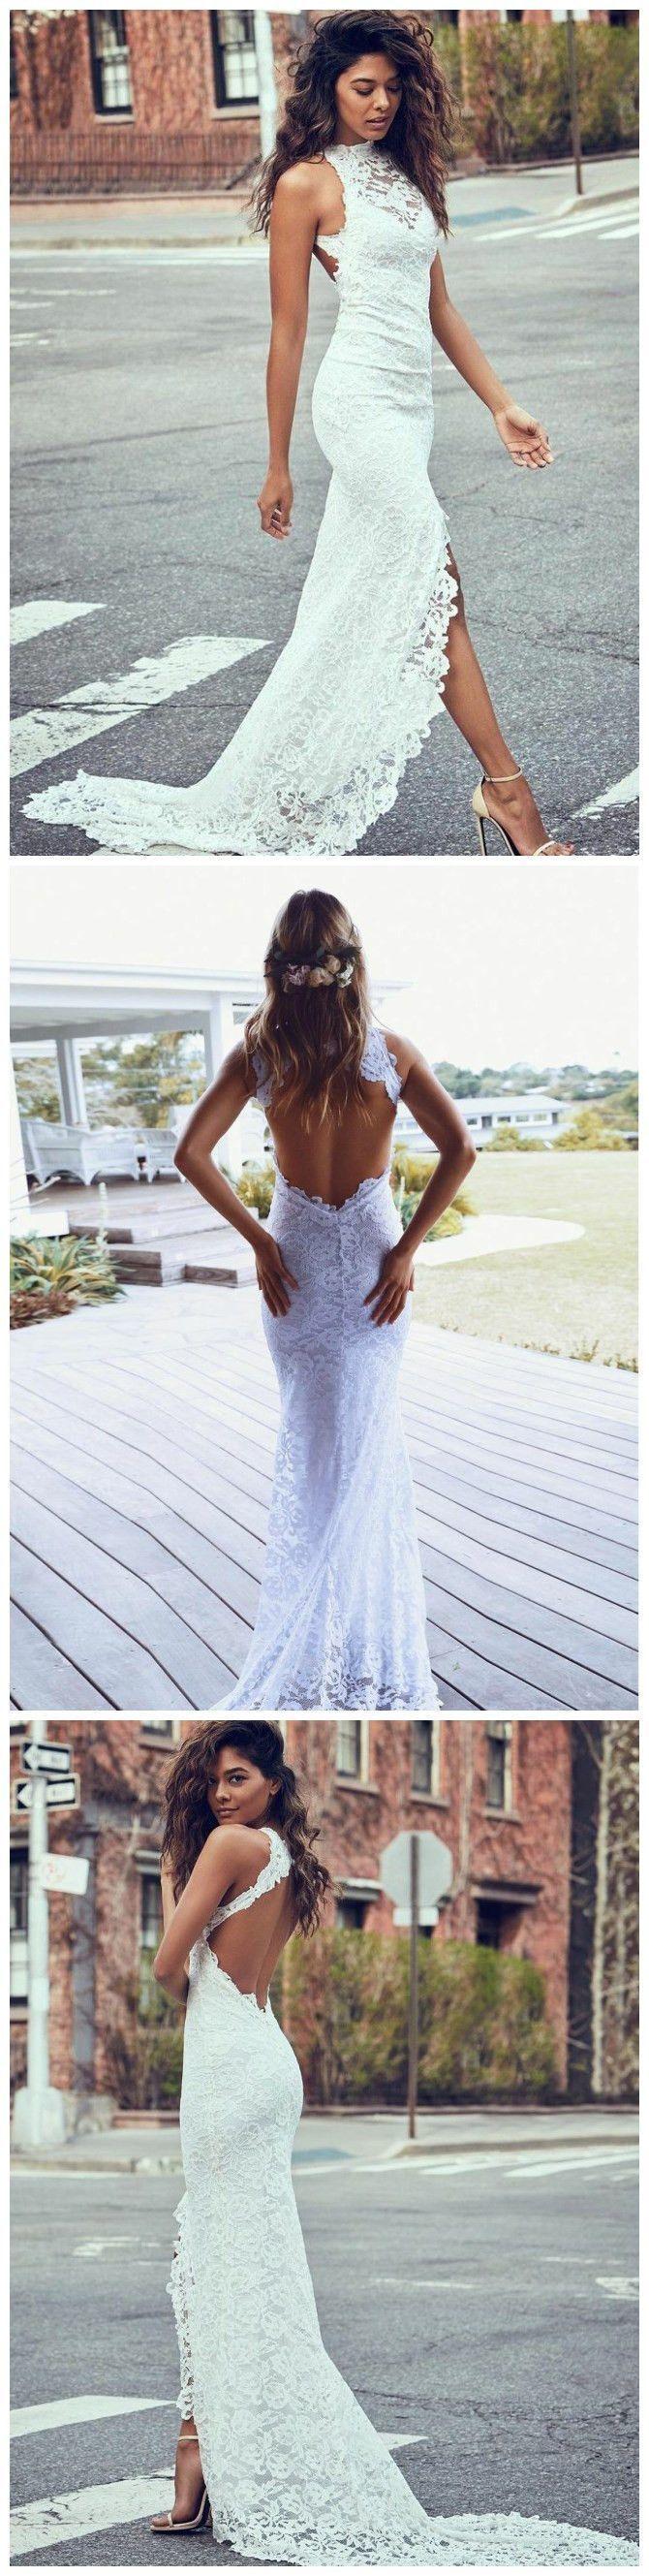 TRUMPET/MERMAID HIGH NECK SLEEVELESS LACE GORGEOUS WEDDING DRESS MODEST BRIDE